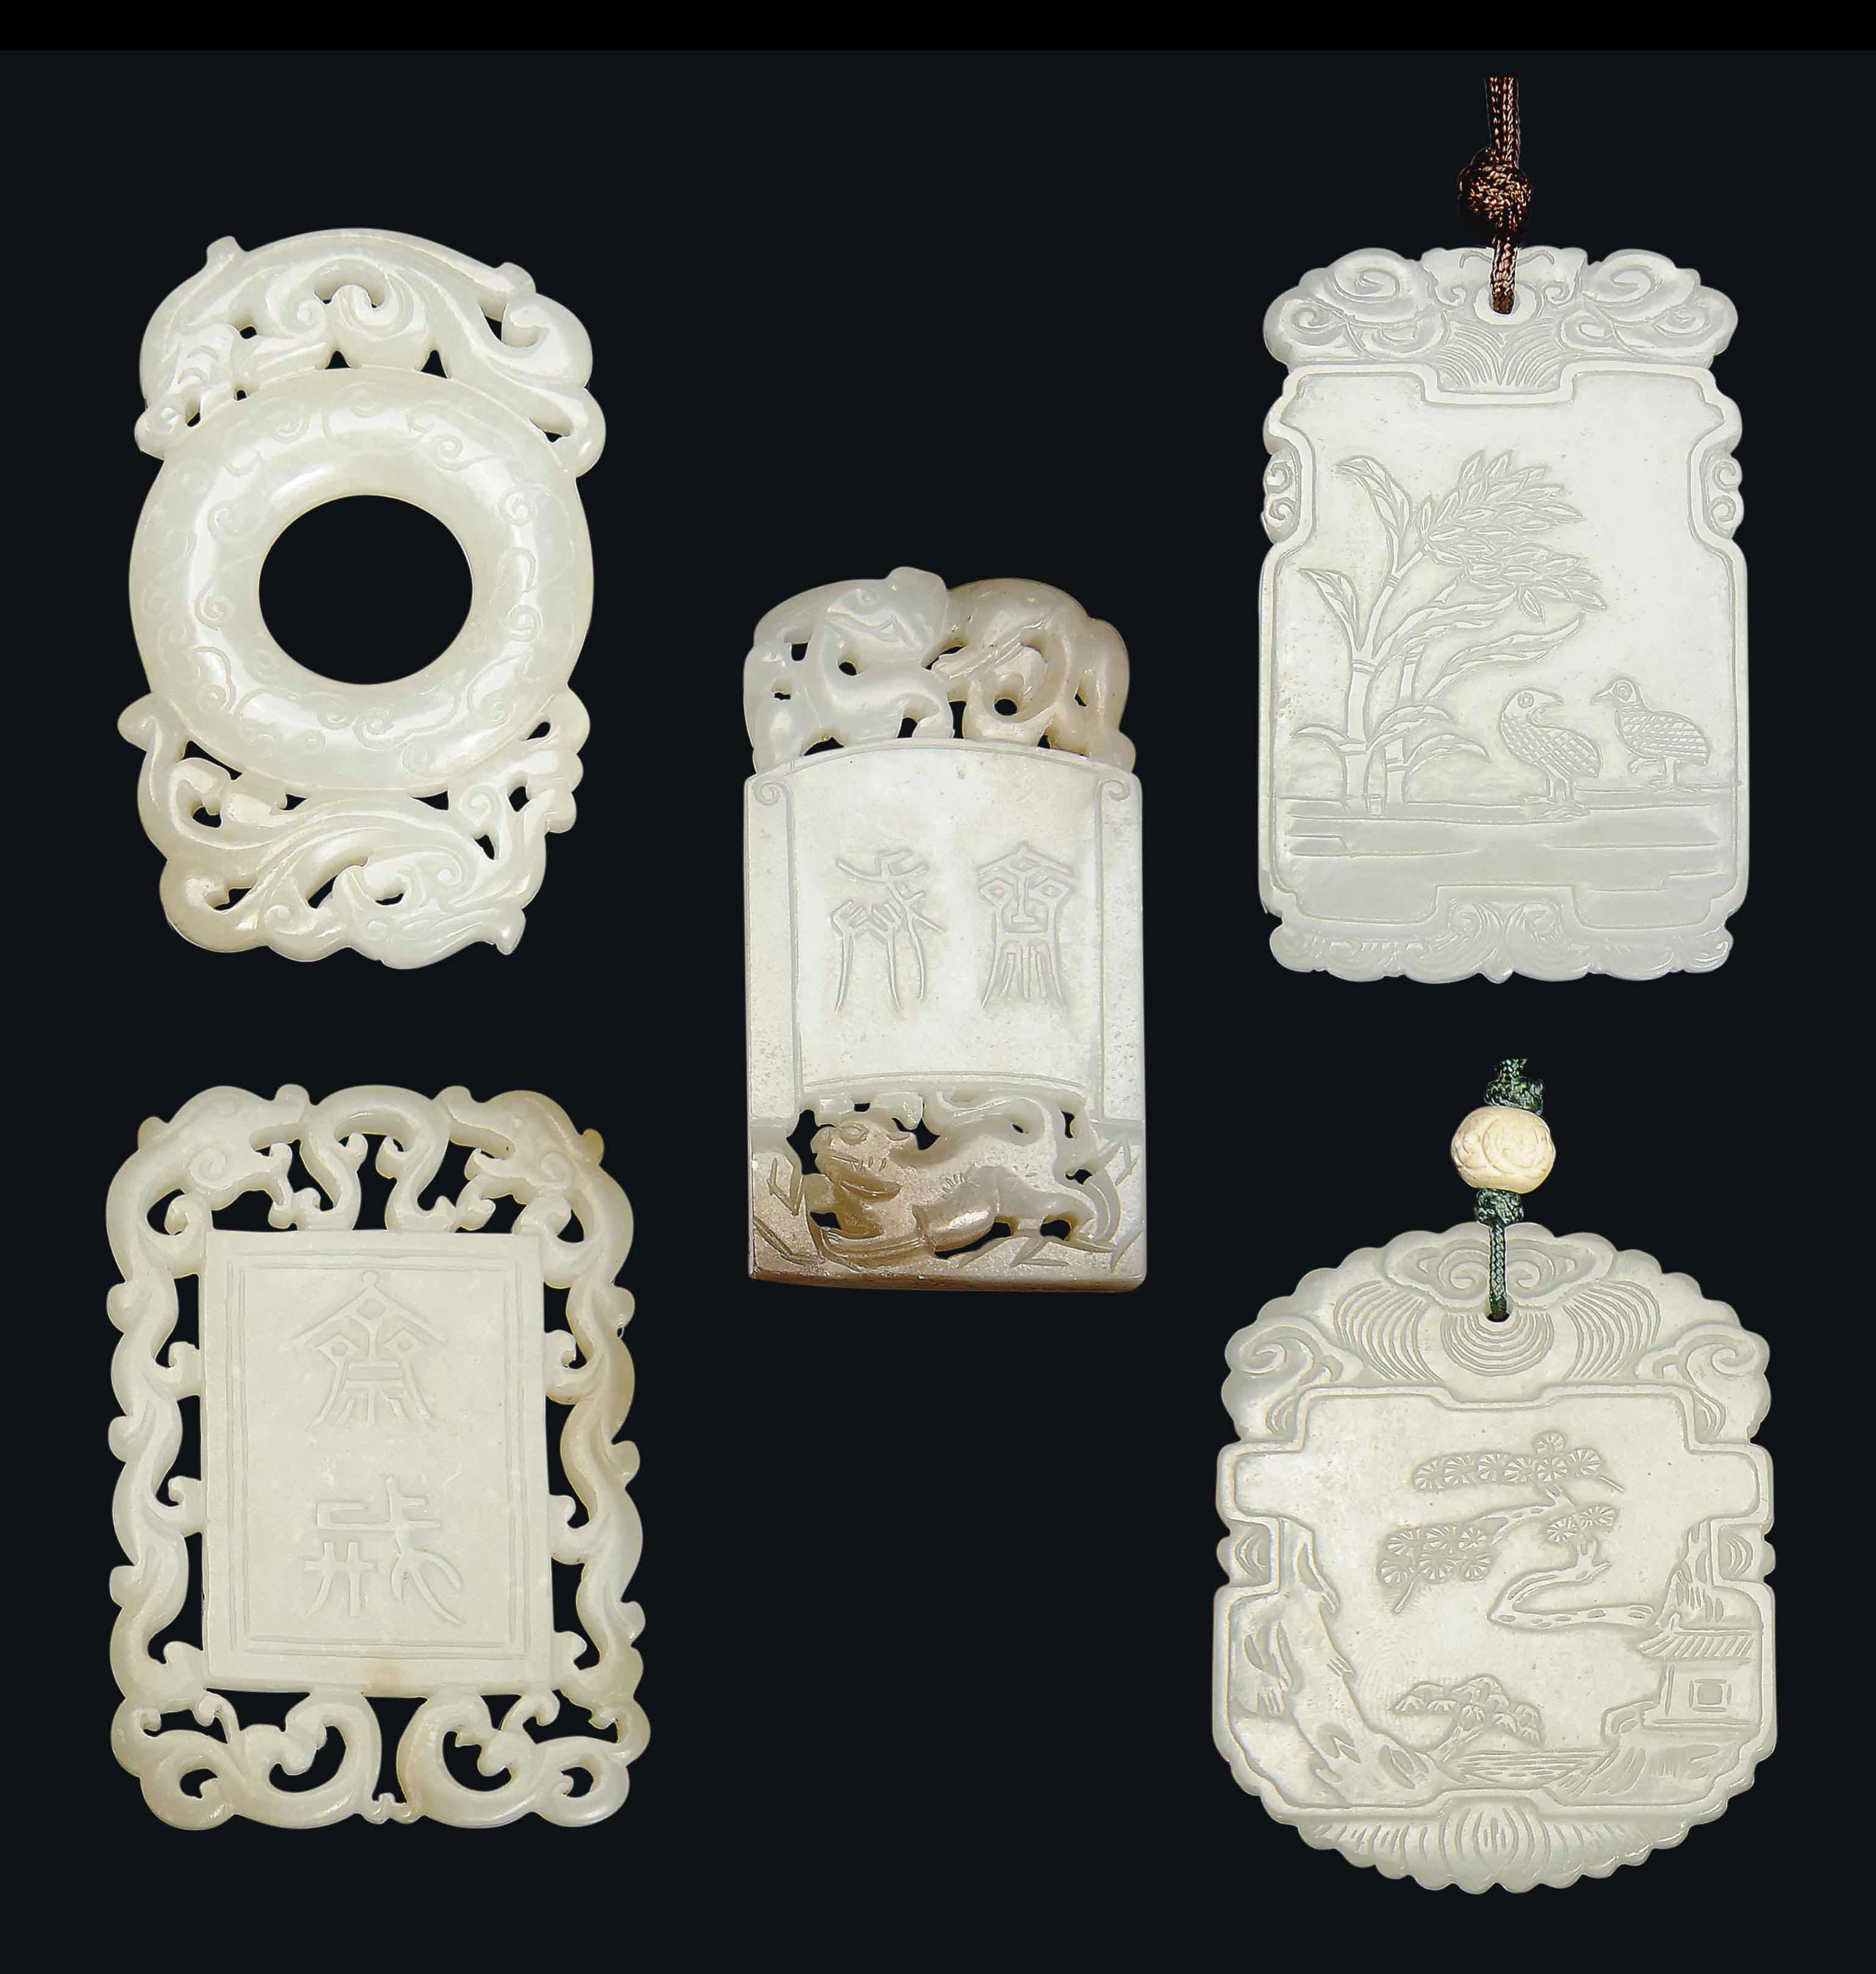 FIVE WHITE AND PALE CELADON JADE PENDANTS